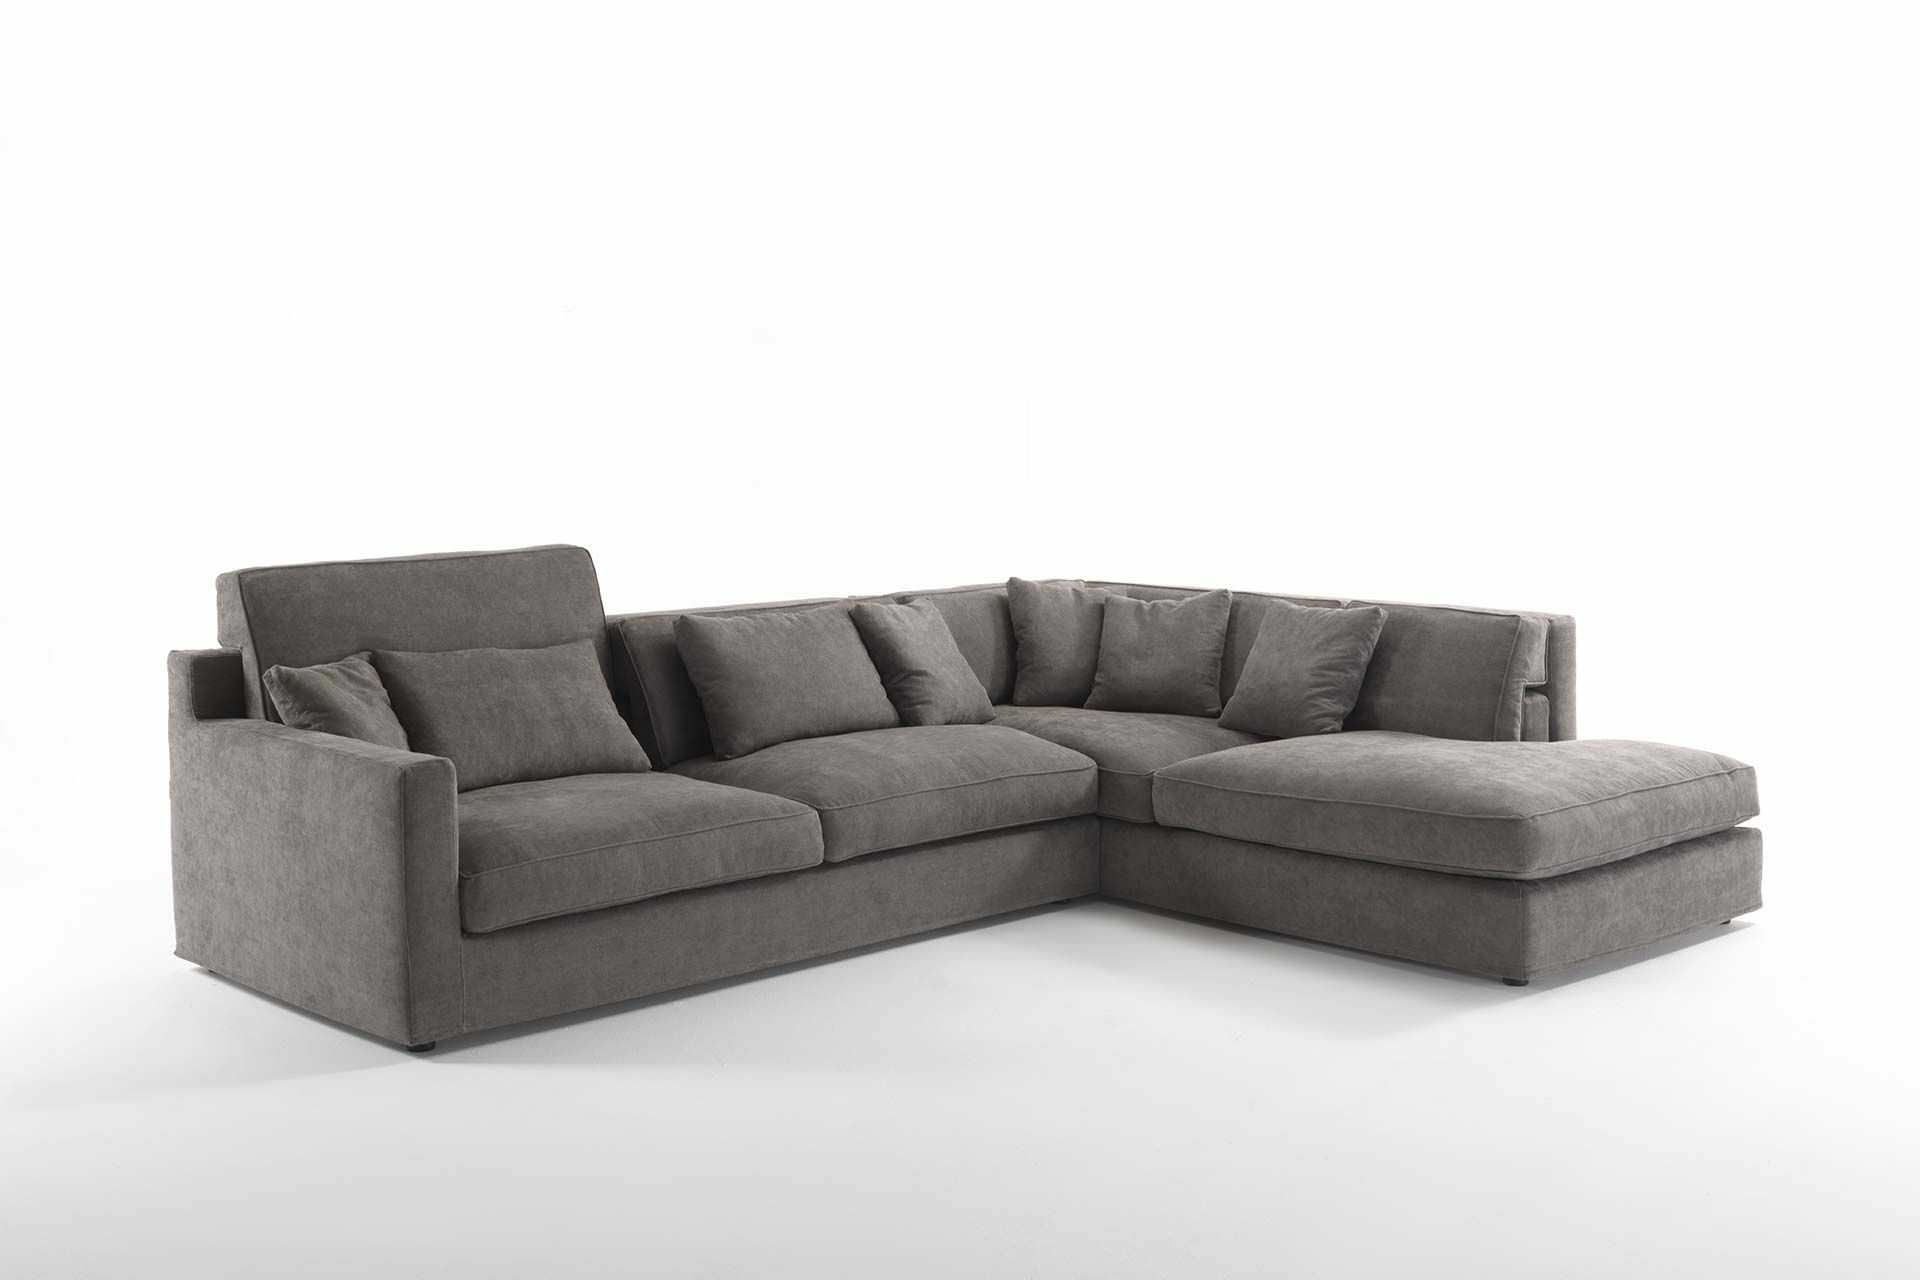 Modular sofa contemporary fabric leather JORDAN Frigerio